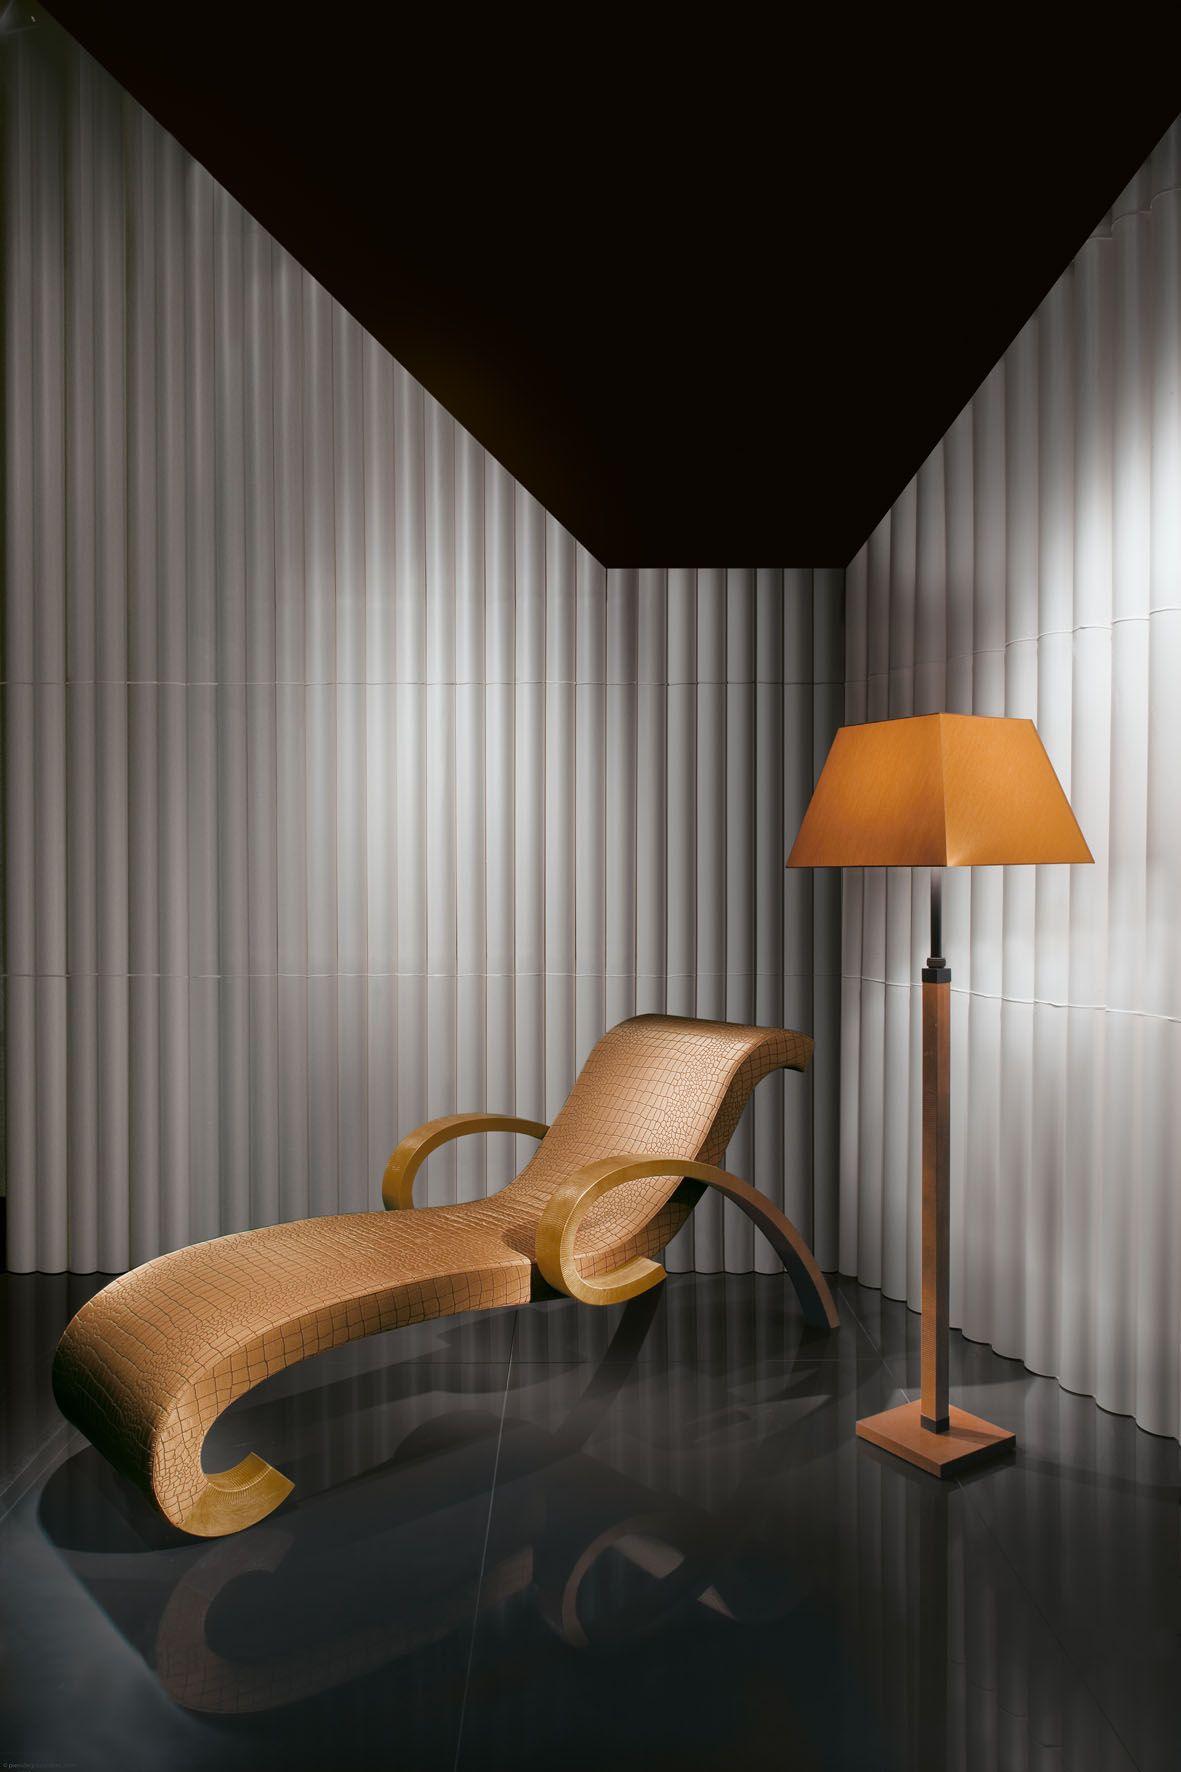 armani casa fuhrender mobel designer, armani casa chair   《 chairs   cadeiras & poltronas 》   pinterest, Design ideen